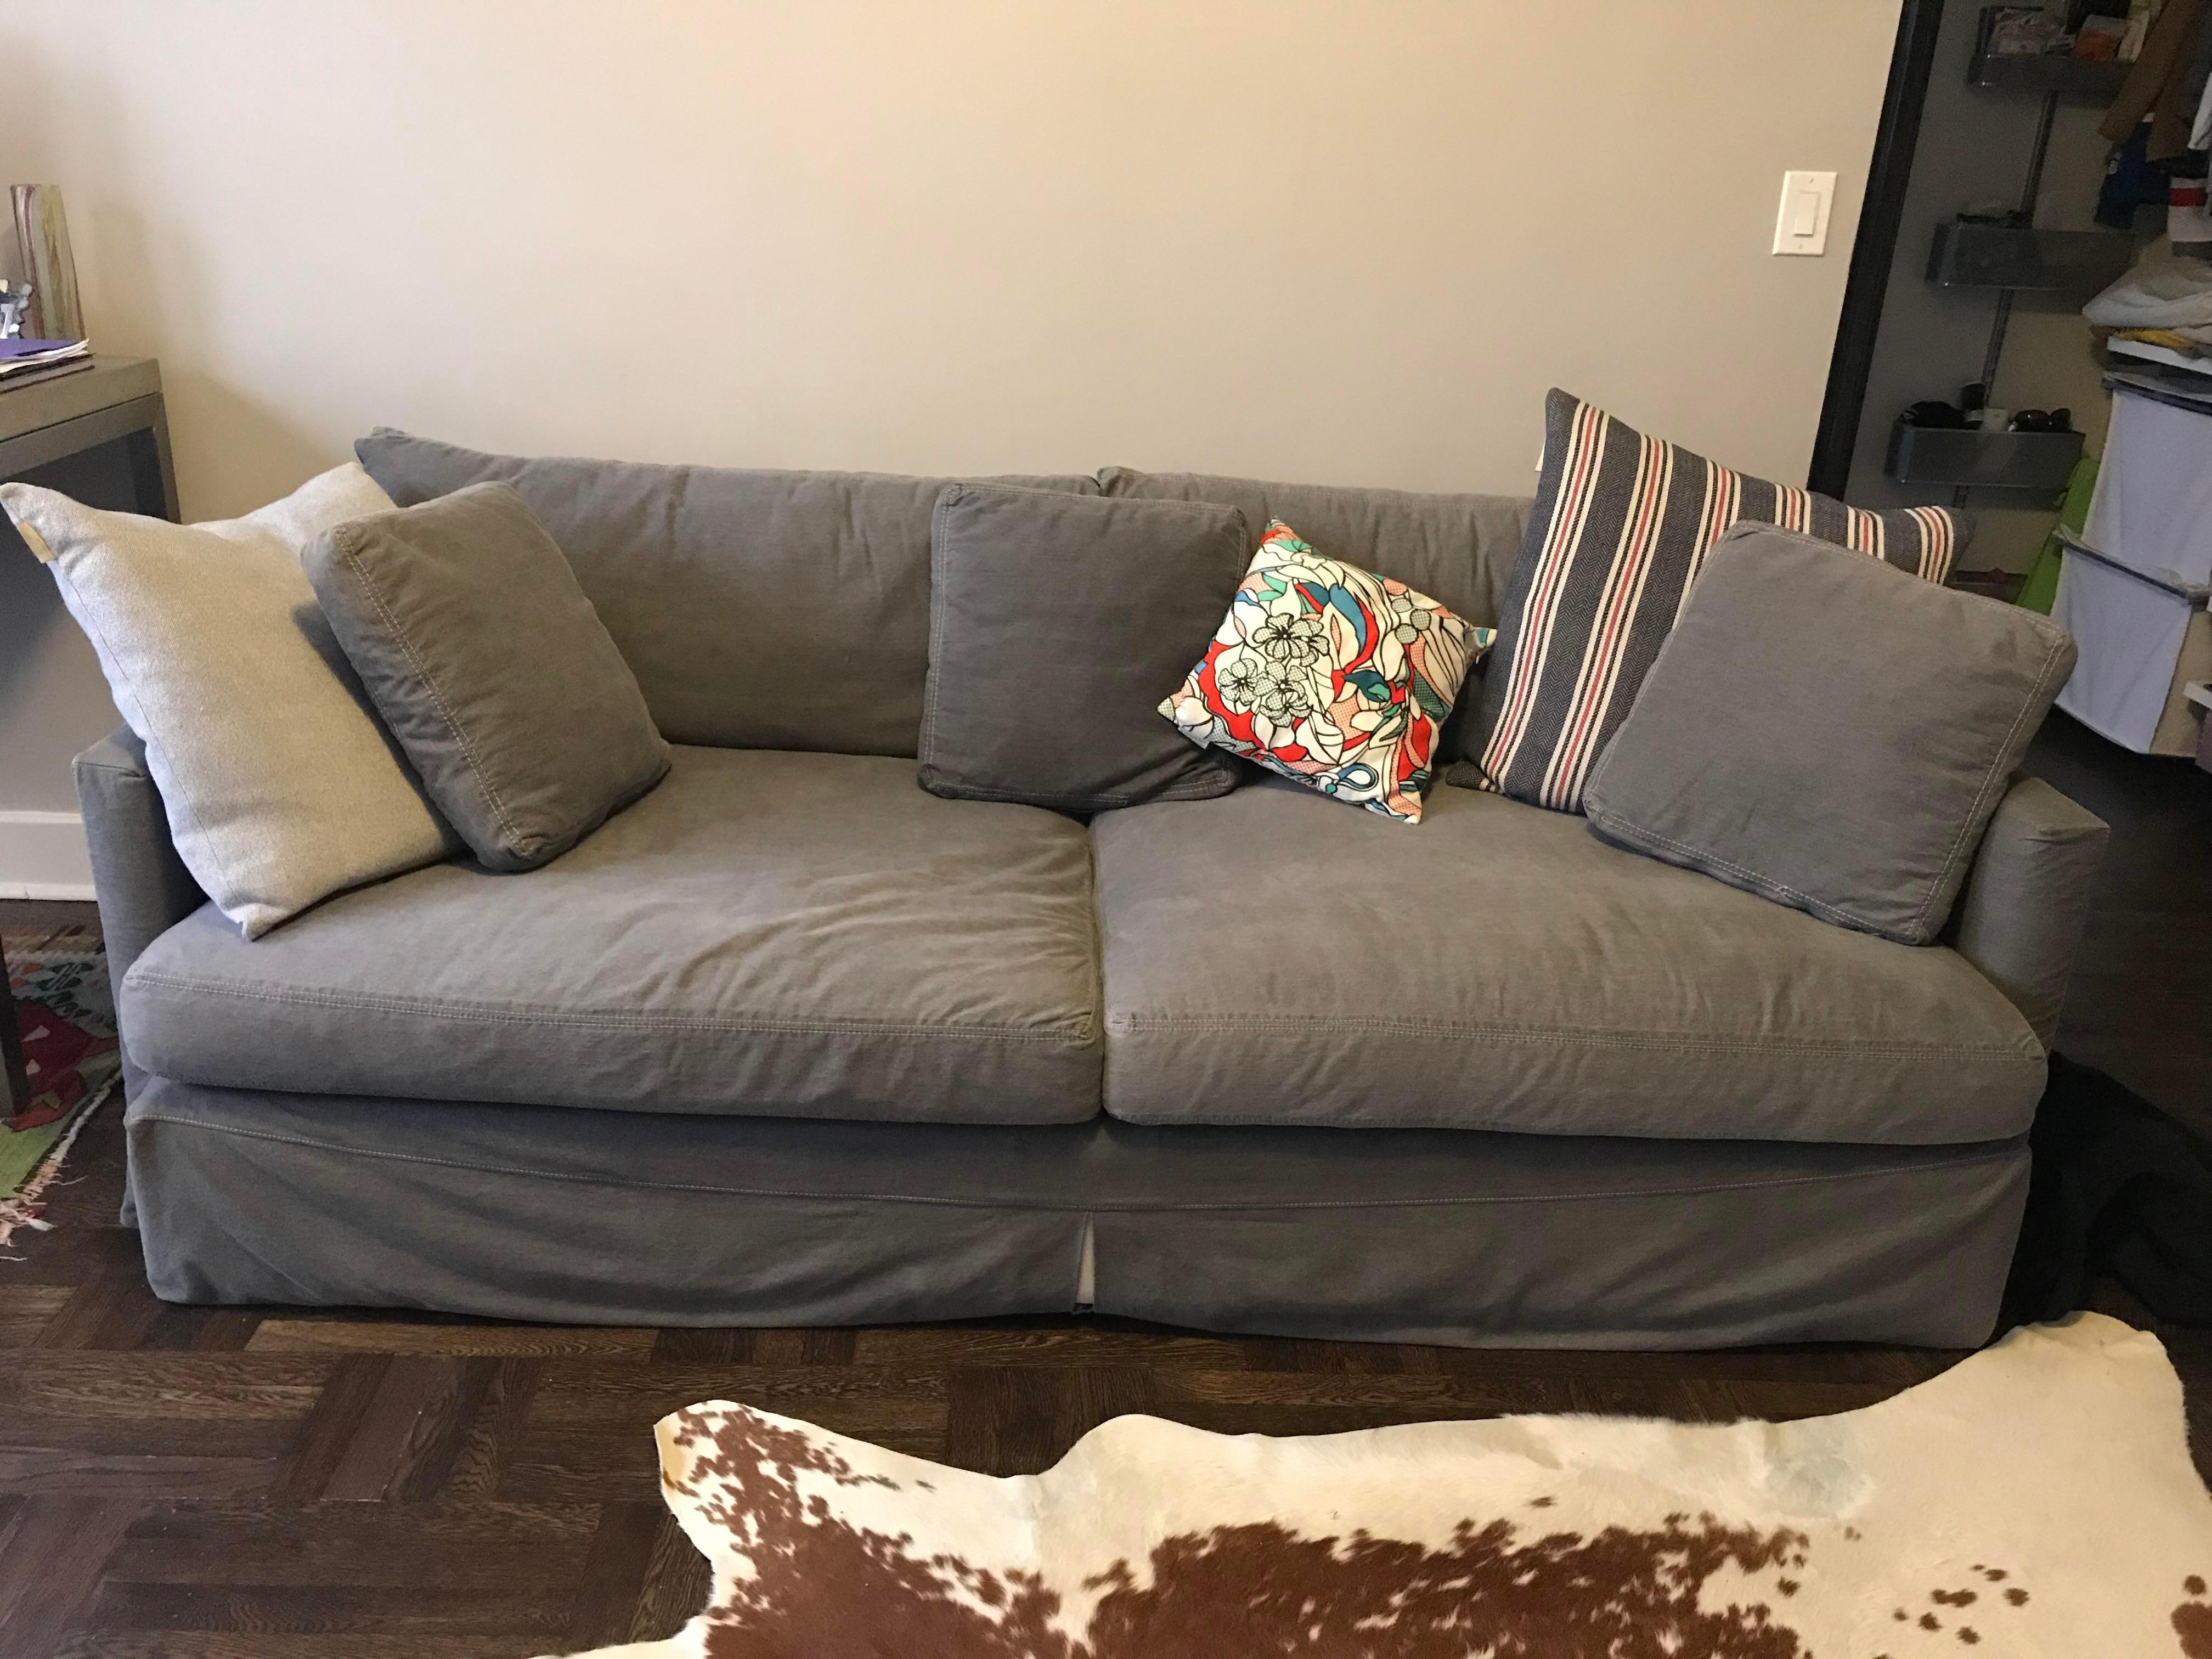 Crate U0026 Barrel Lounge Sofa With Washable Slipcovers   Image 2 ...